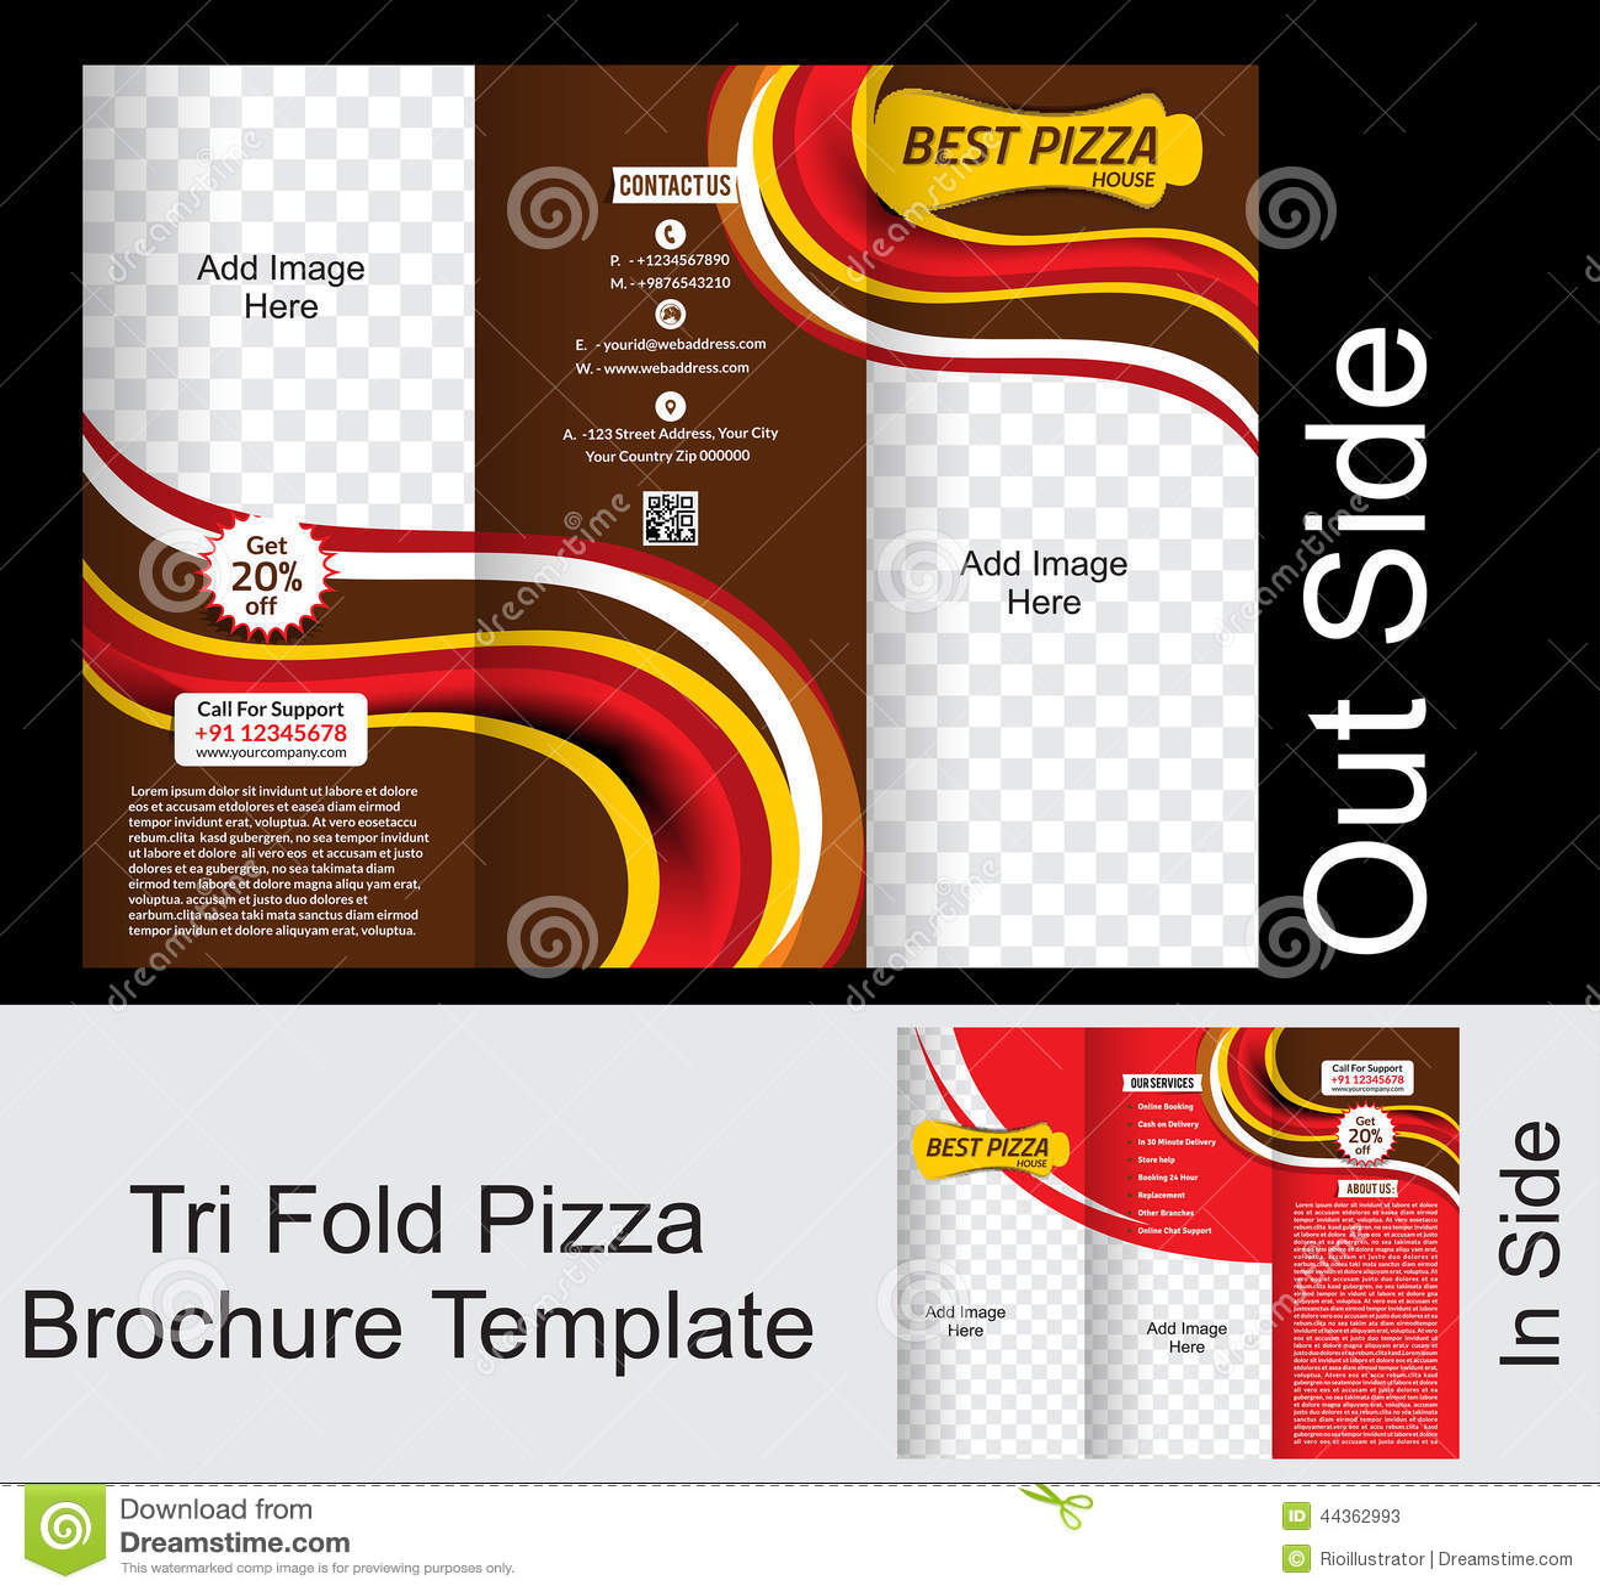 tri fold pizza brochure tempate stock illustration